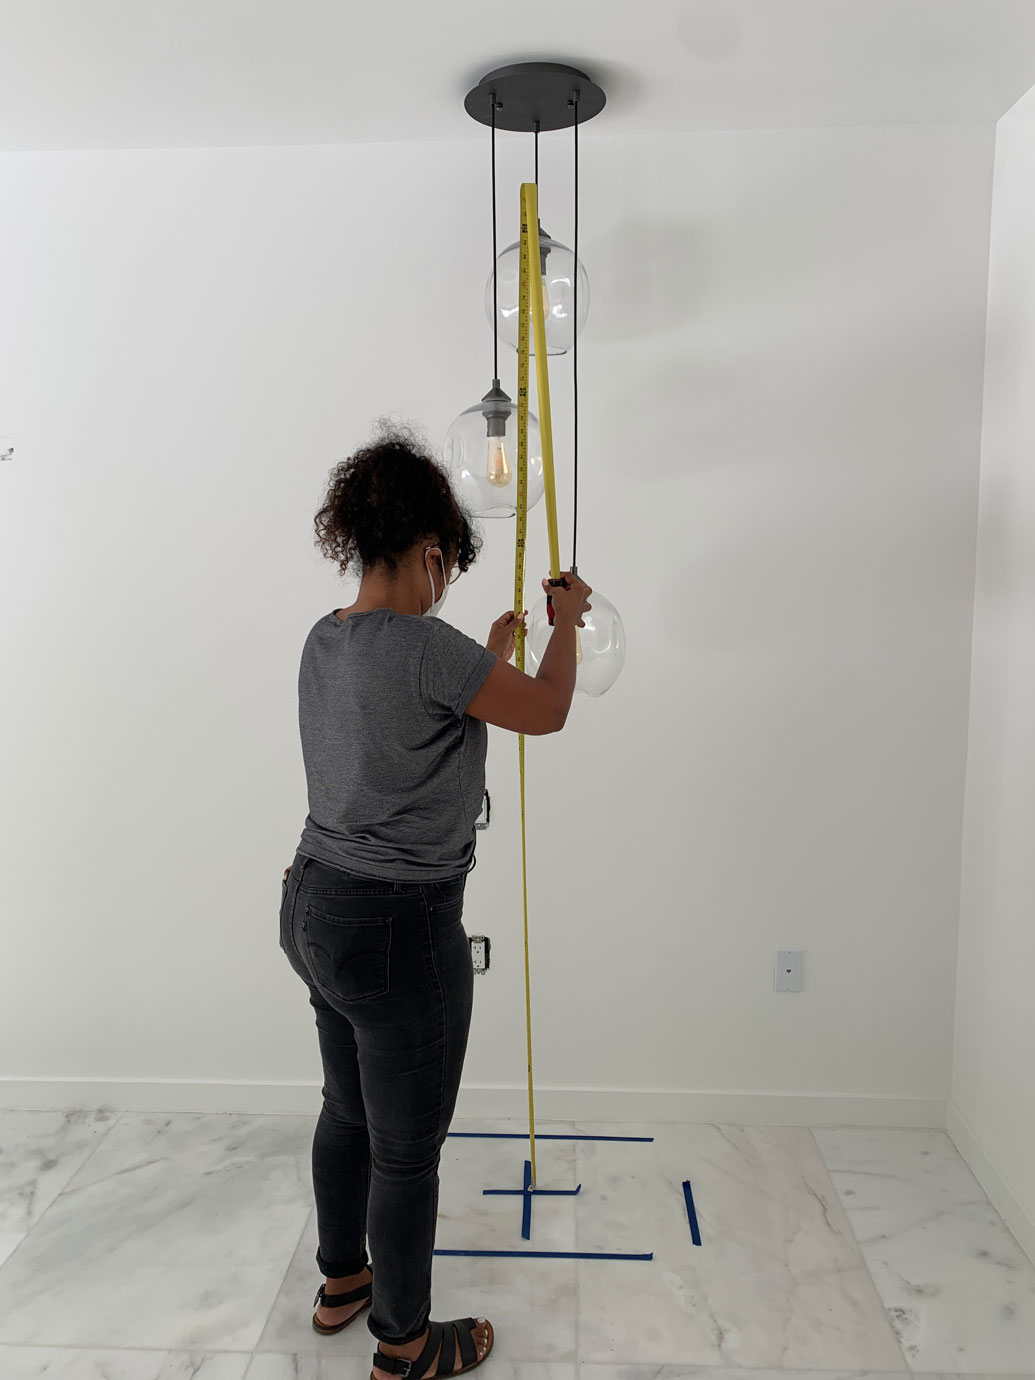 Miami Home Design: Relocating During the Coronavirus Pandemic